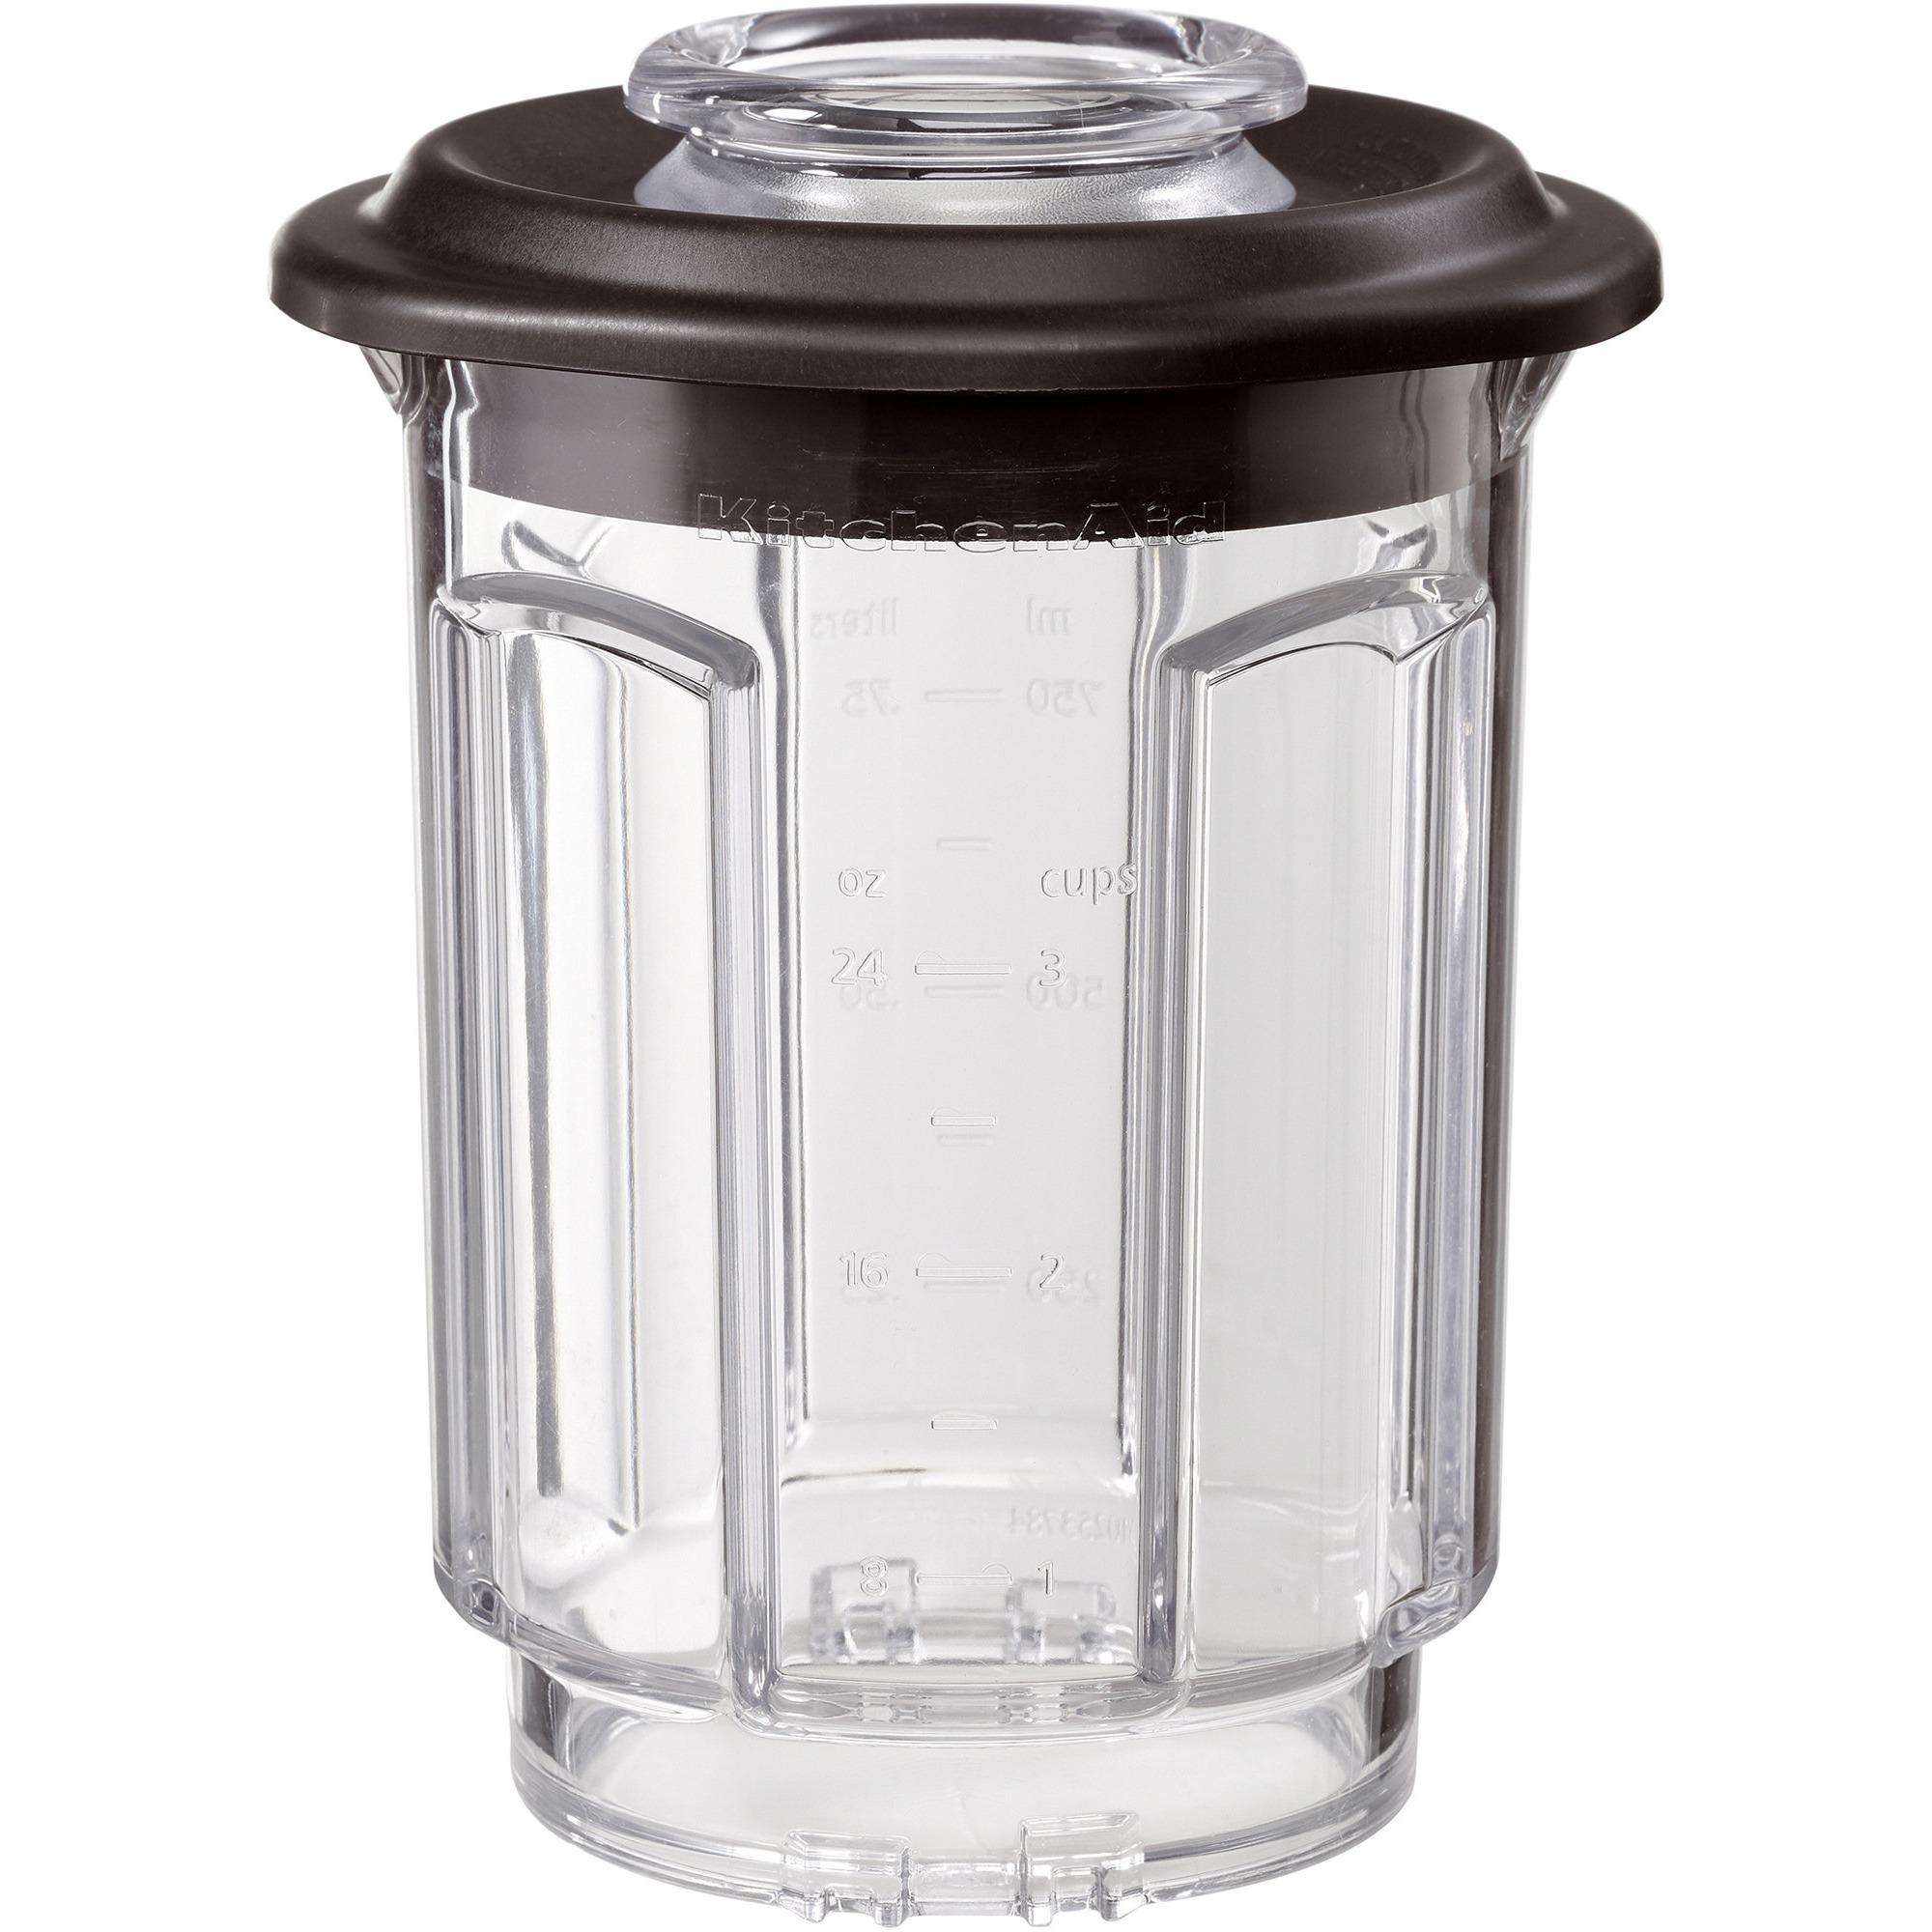 KitchenAid Blendkolbe uten håndtak, klar 0,75L